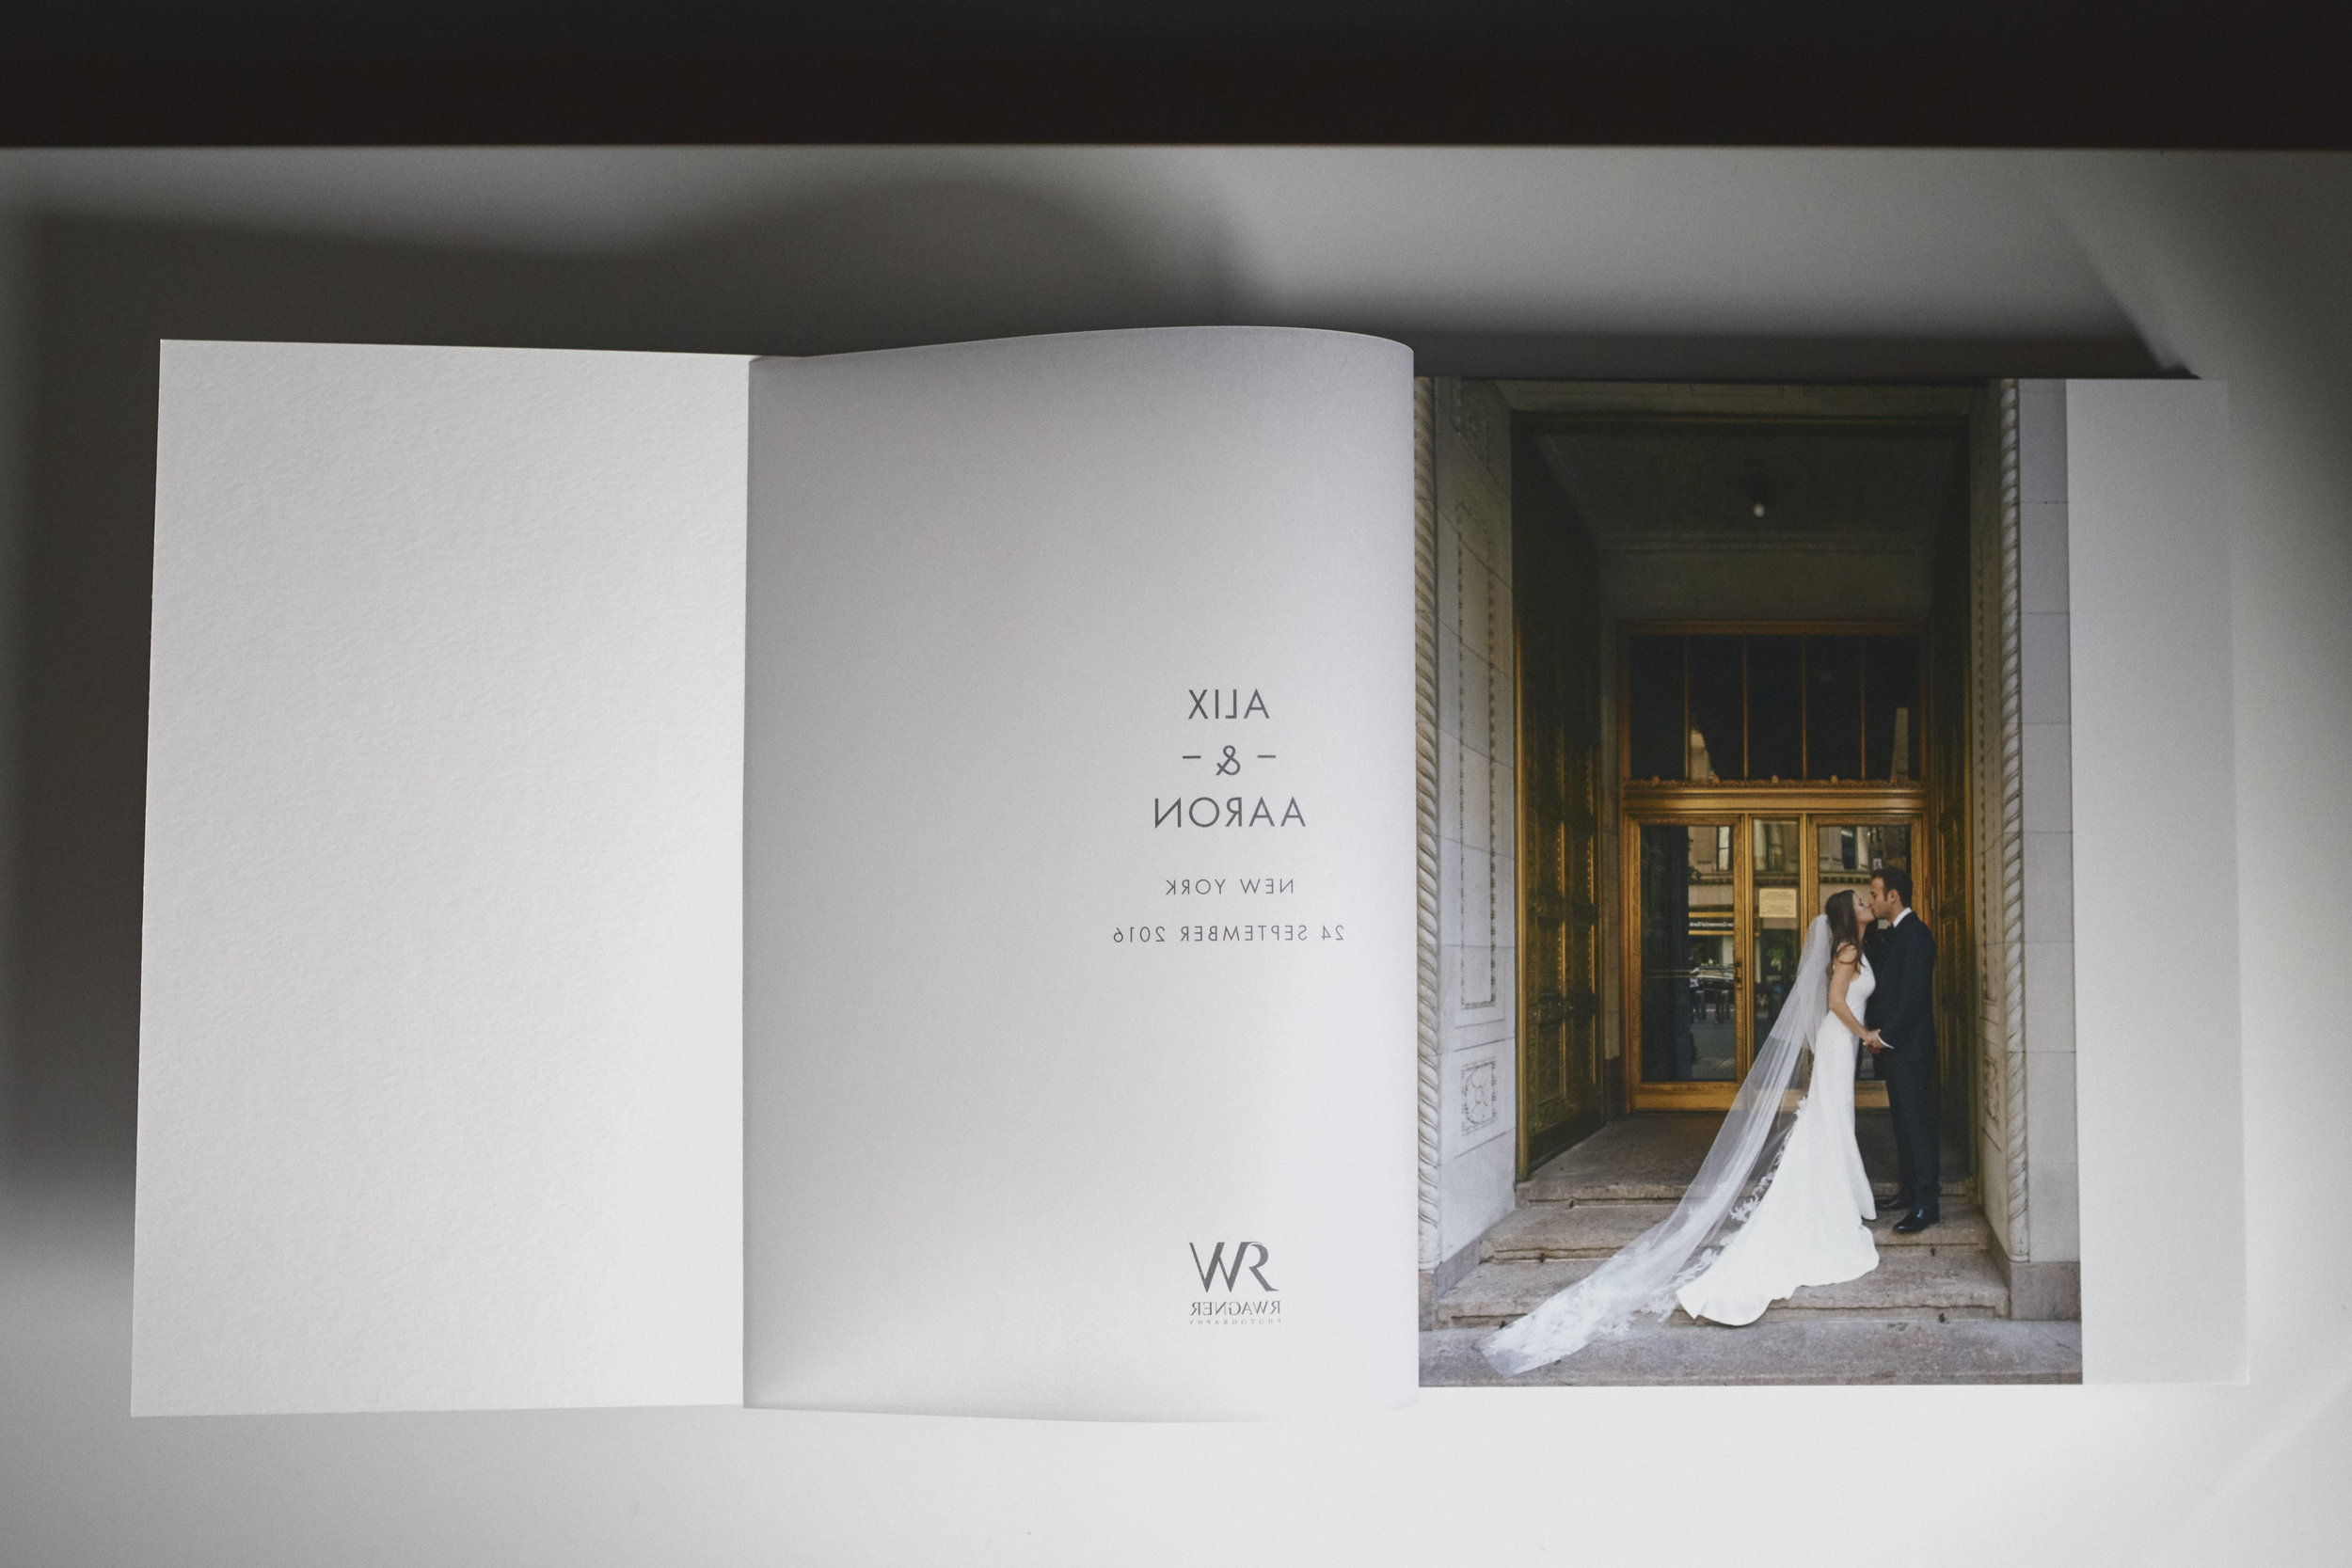 019_RWagner_Wedding_Album.jpg